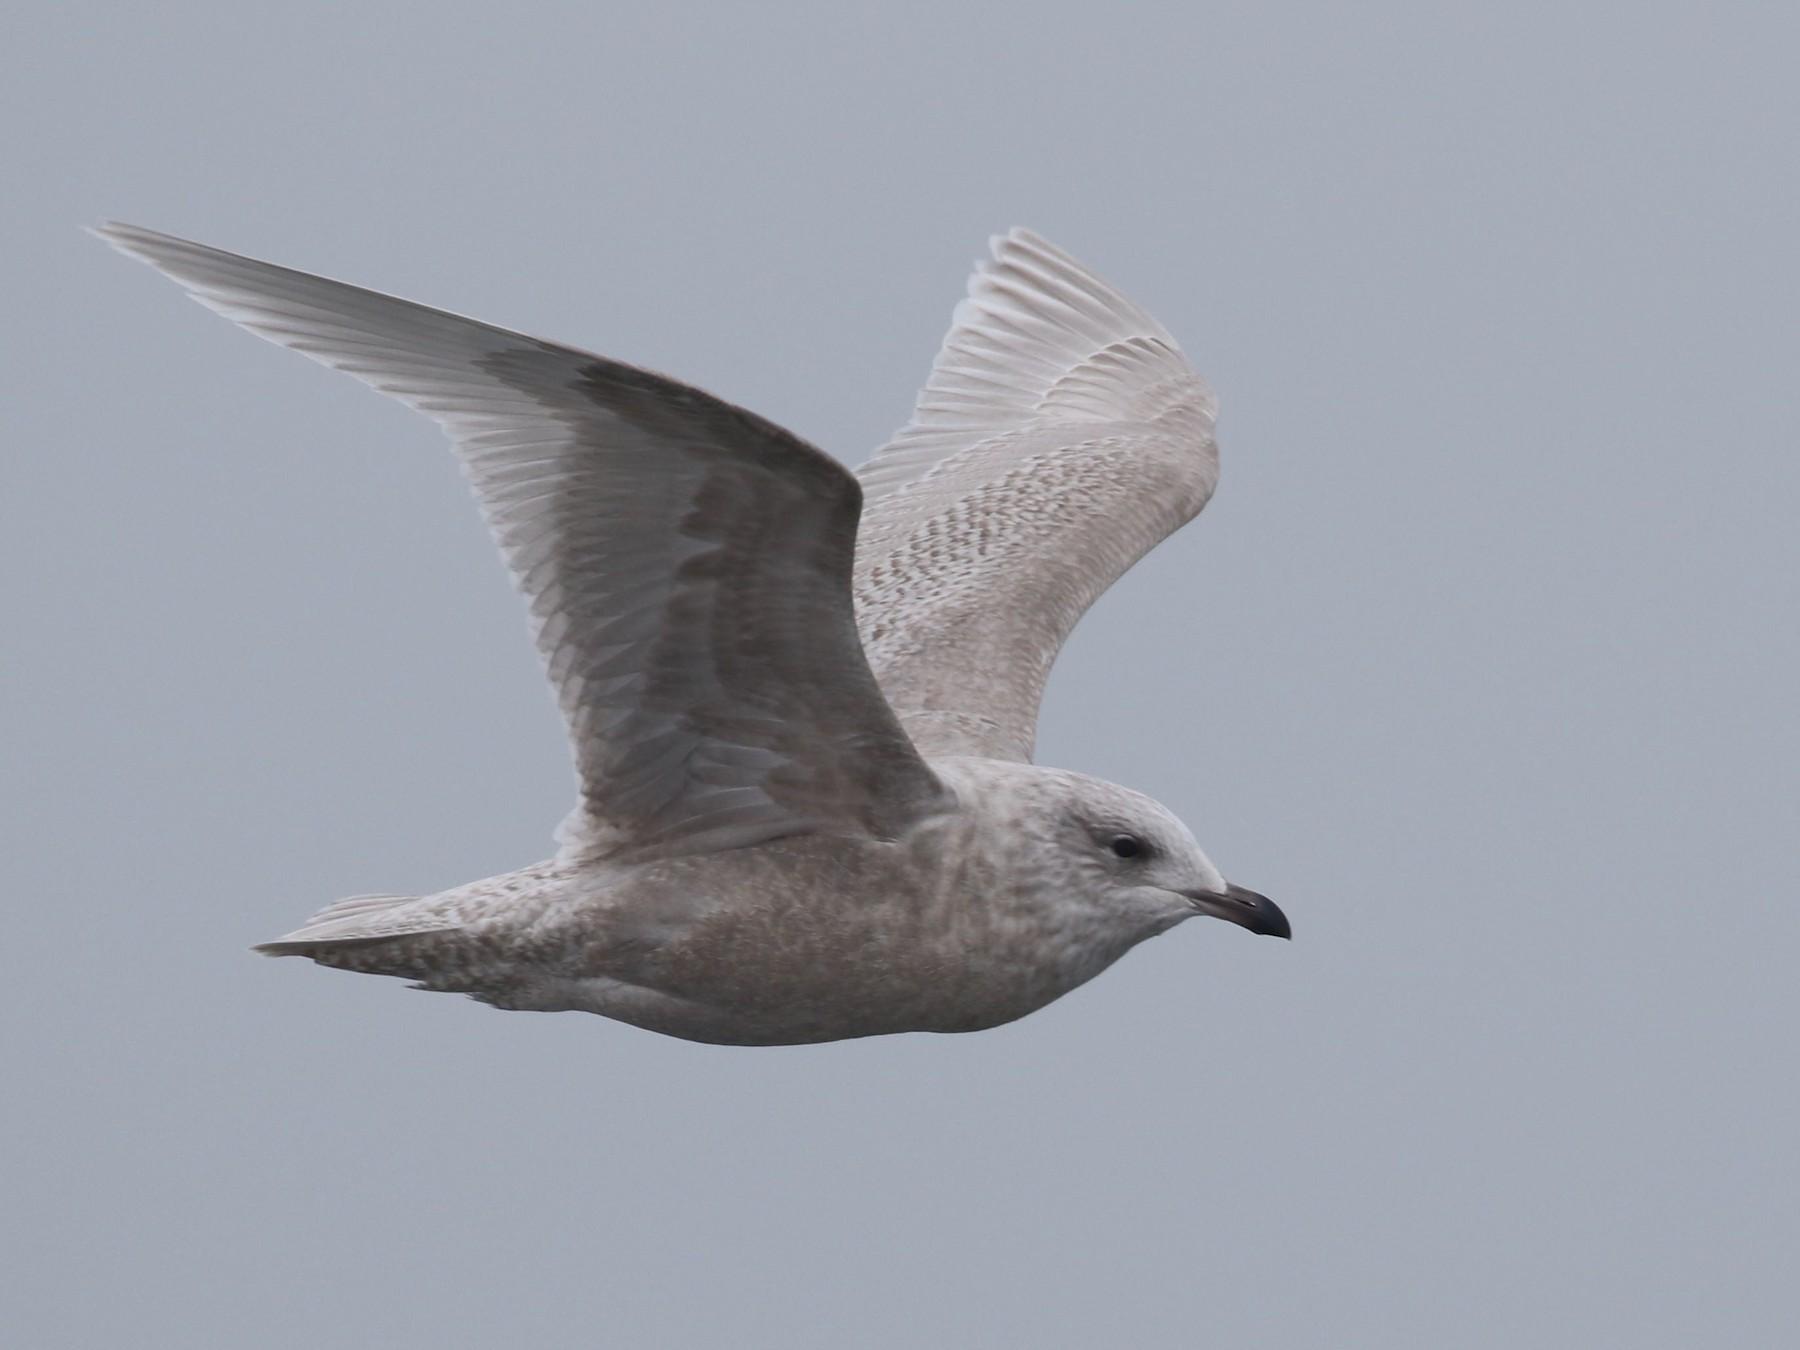 Iceland Gull - Alvan Buckley